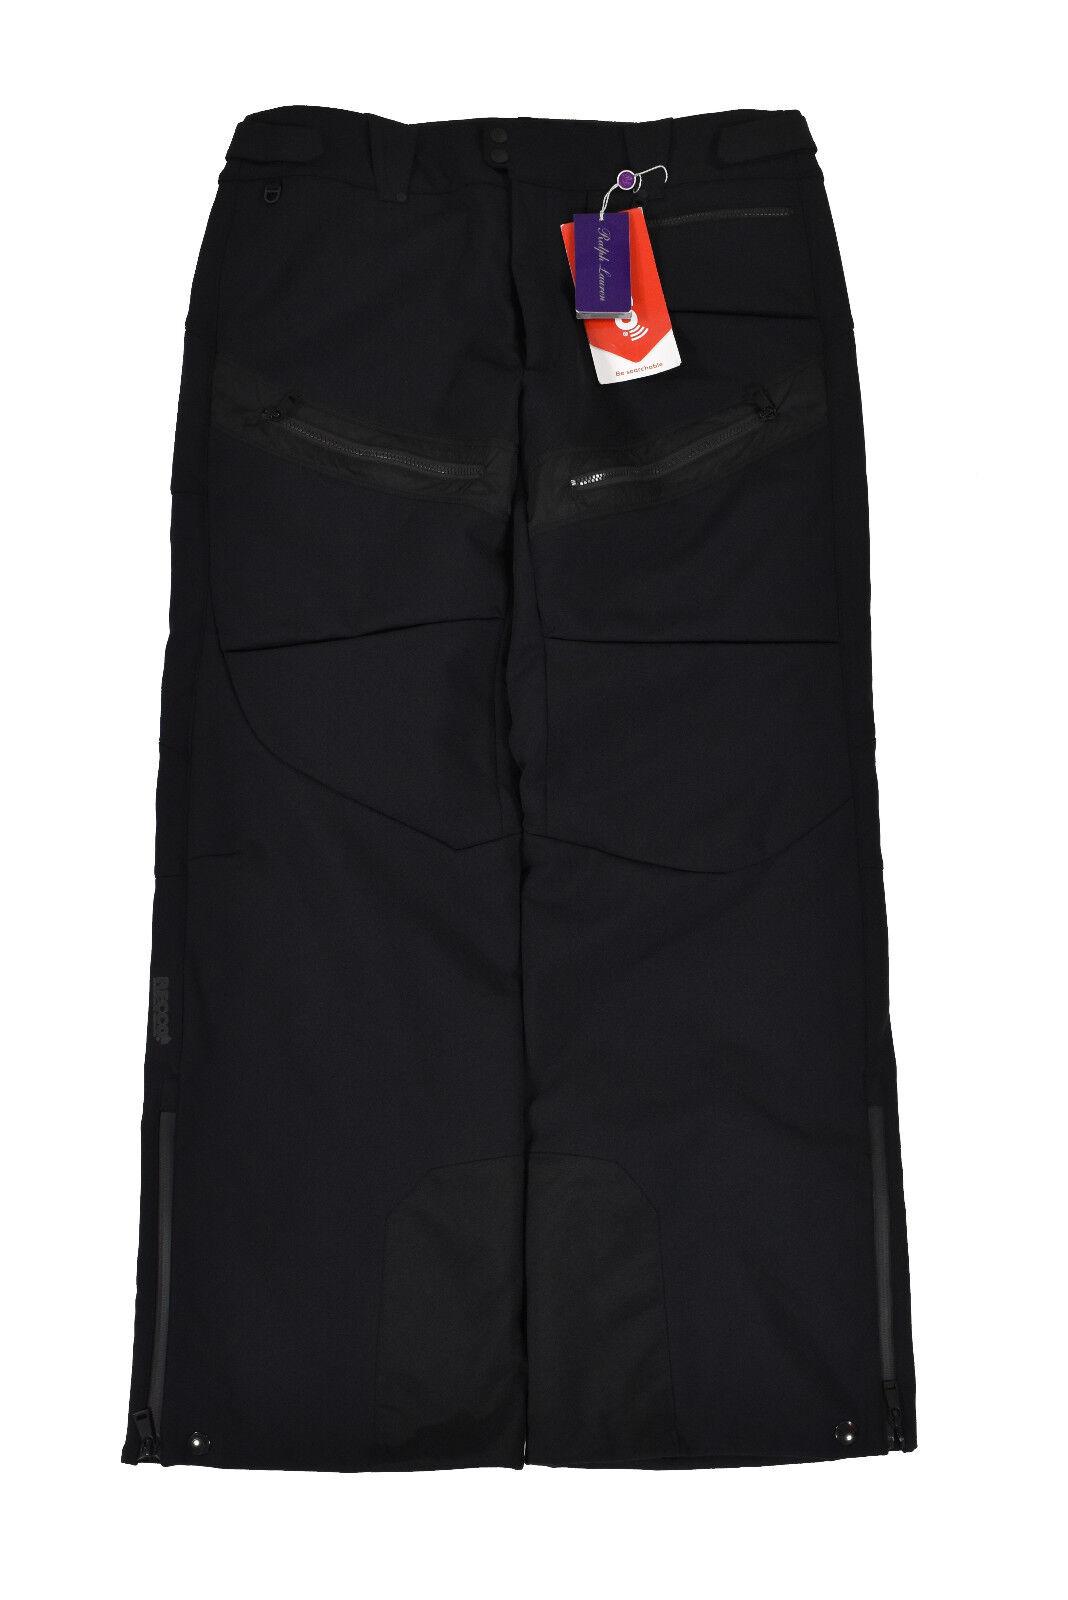 Ralph Lauren púrpura Label Negro Recco Esquí Tabla Nieve Pantalones XXL Nuevo